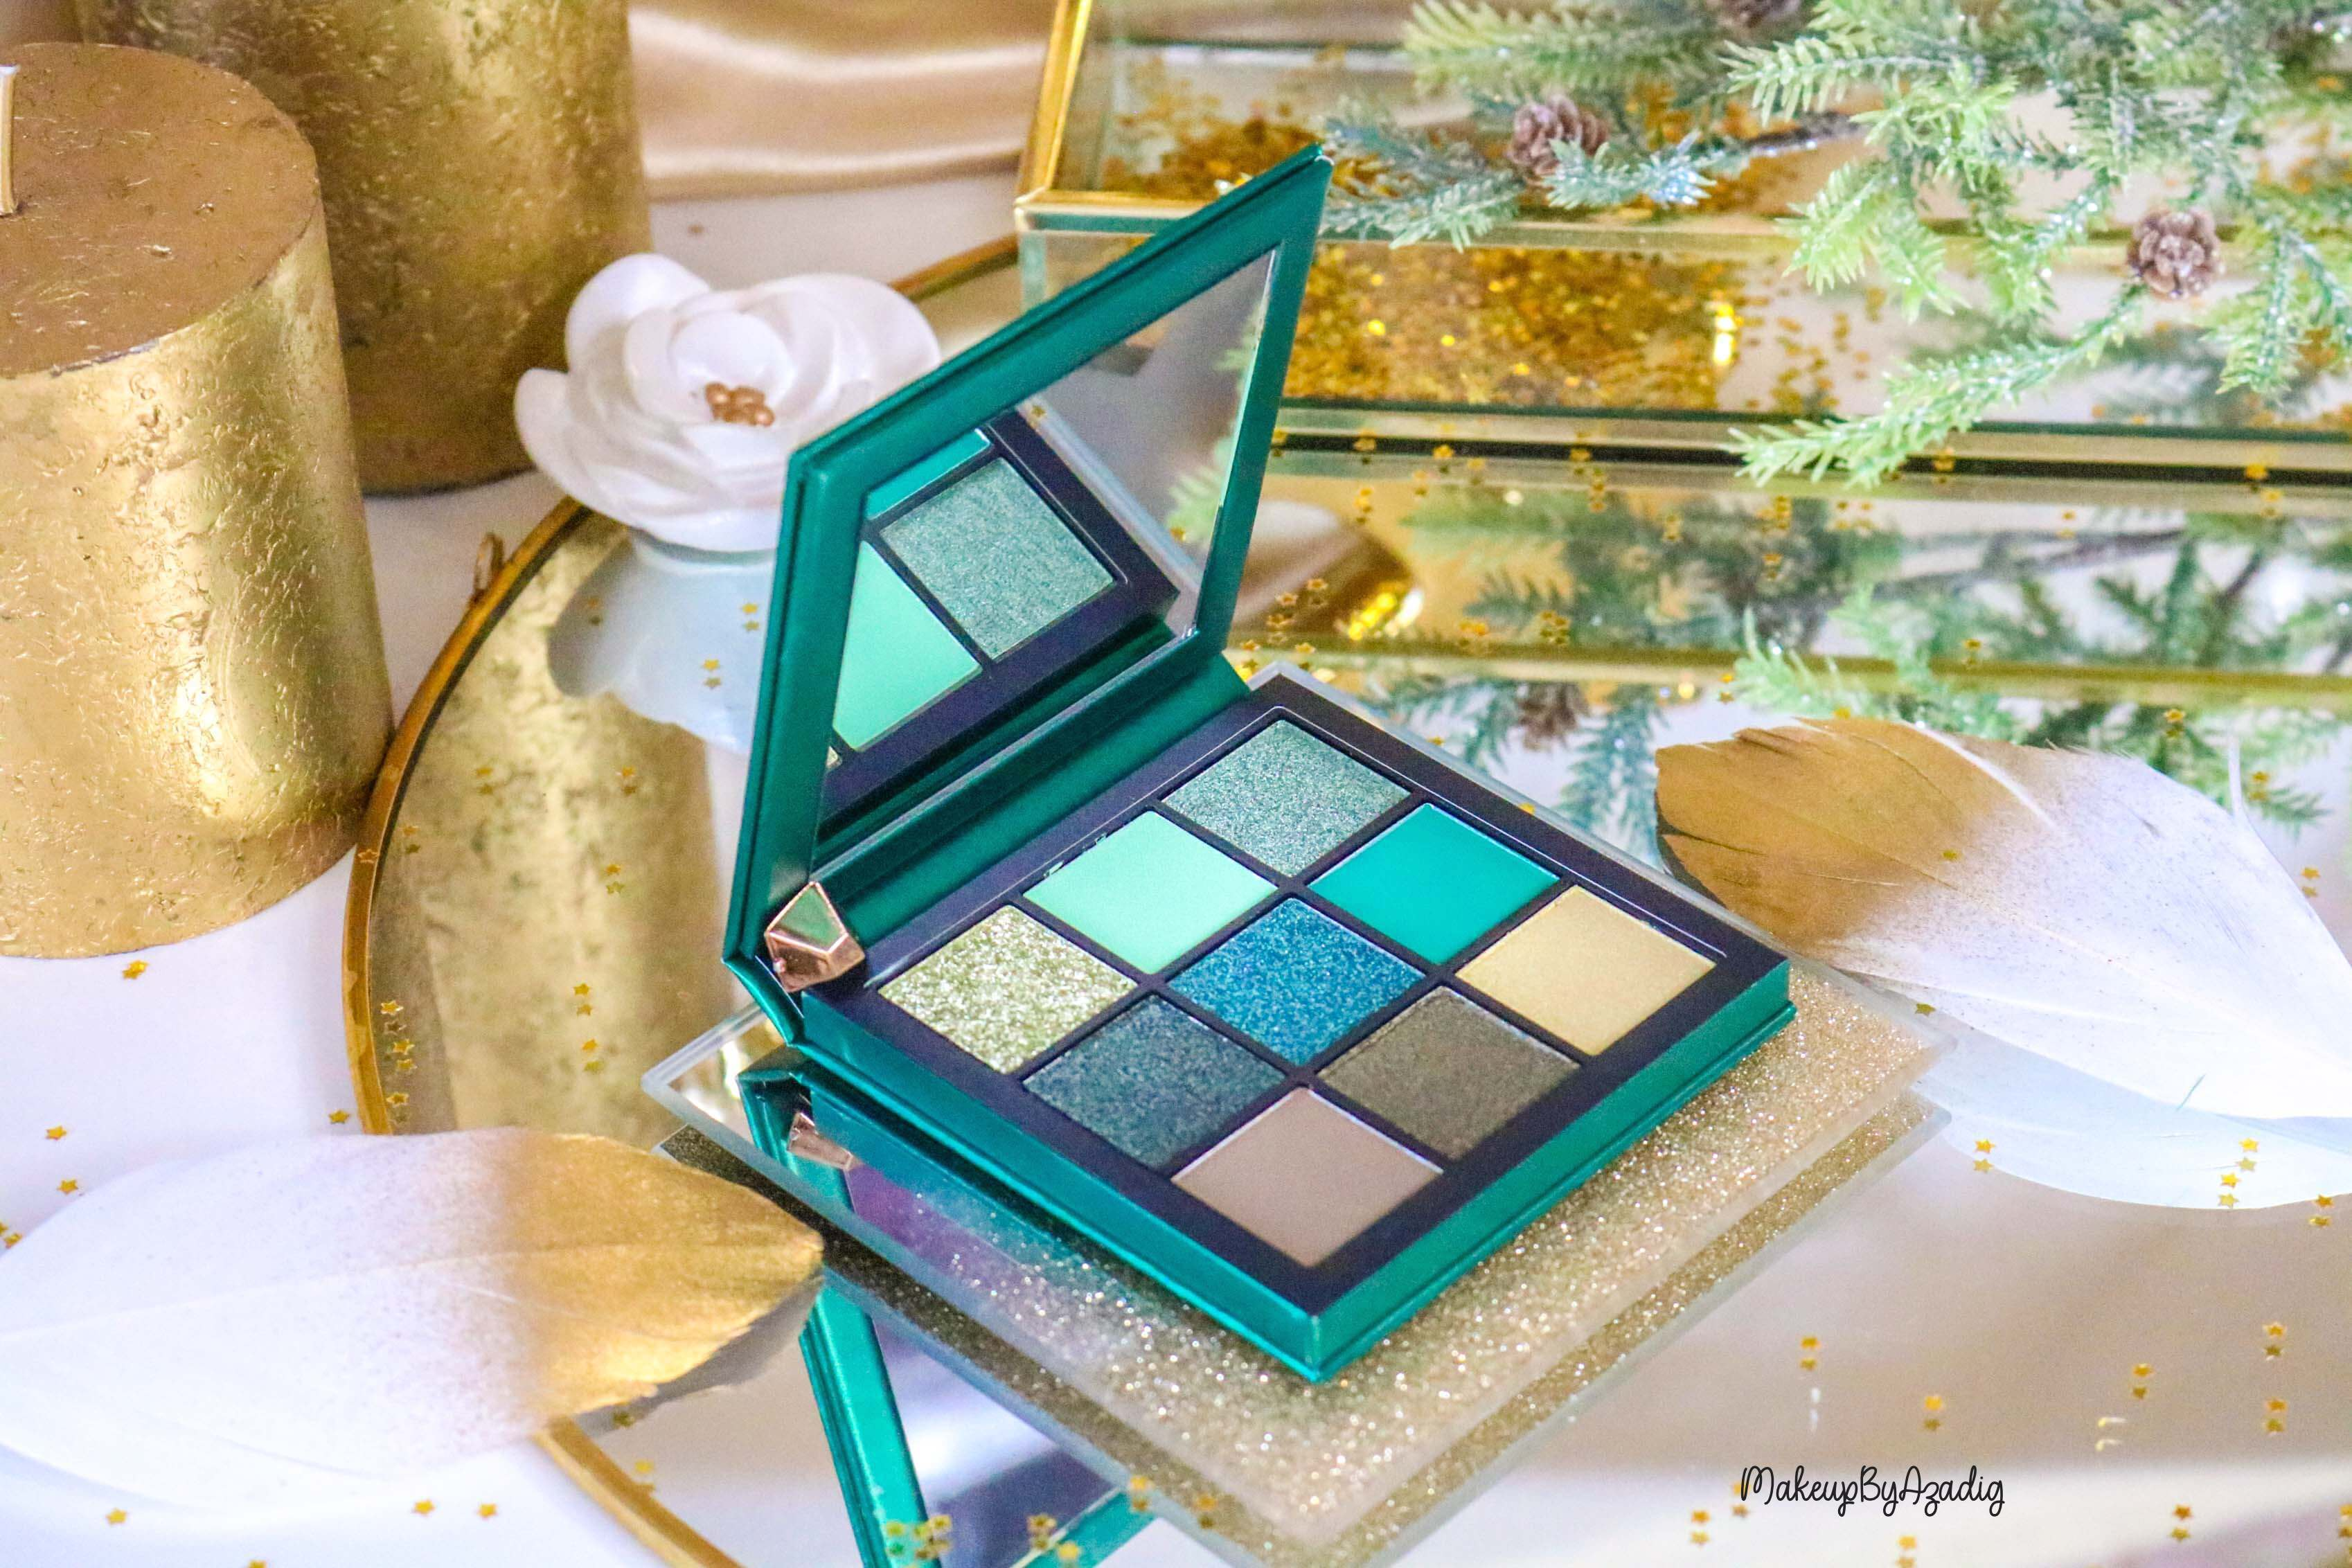 revue-review-palette-emerald-obsessions-huda-beauty-topaz-sapphire-avis-prix-swatch-makeupbyazadig-meilleure-green